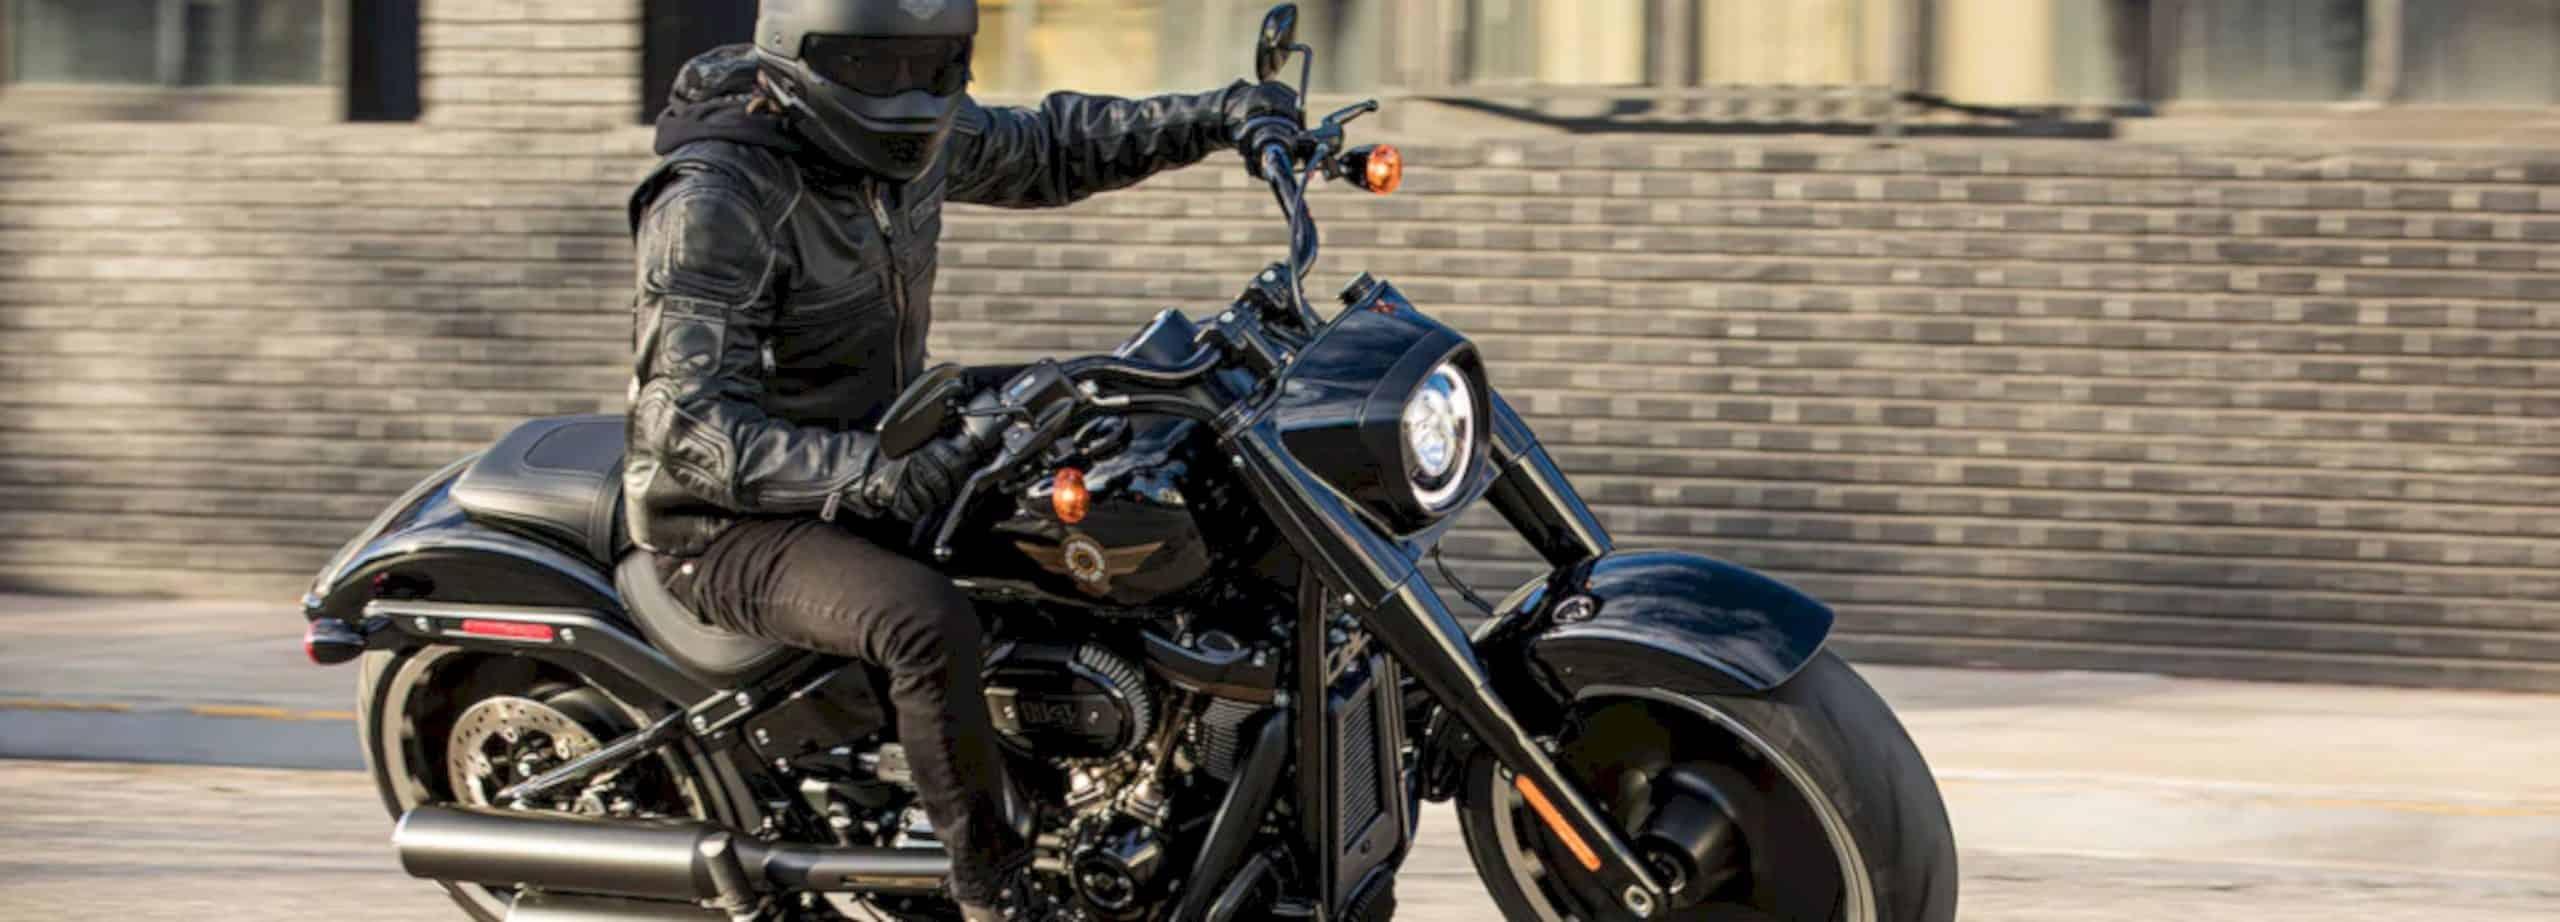 Harley Davidson 2020 Fat Boy® 114 Motorcycle 2